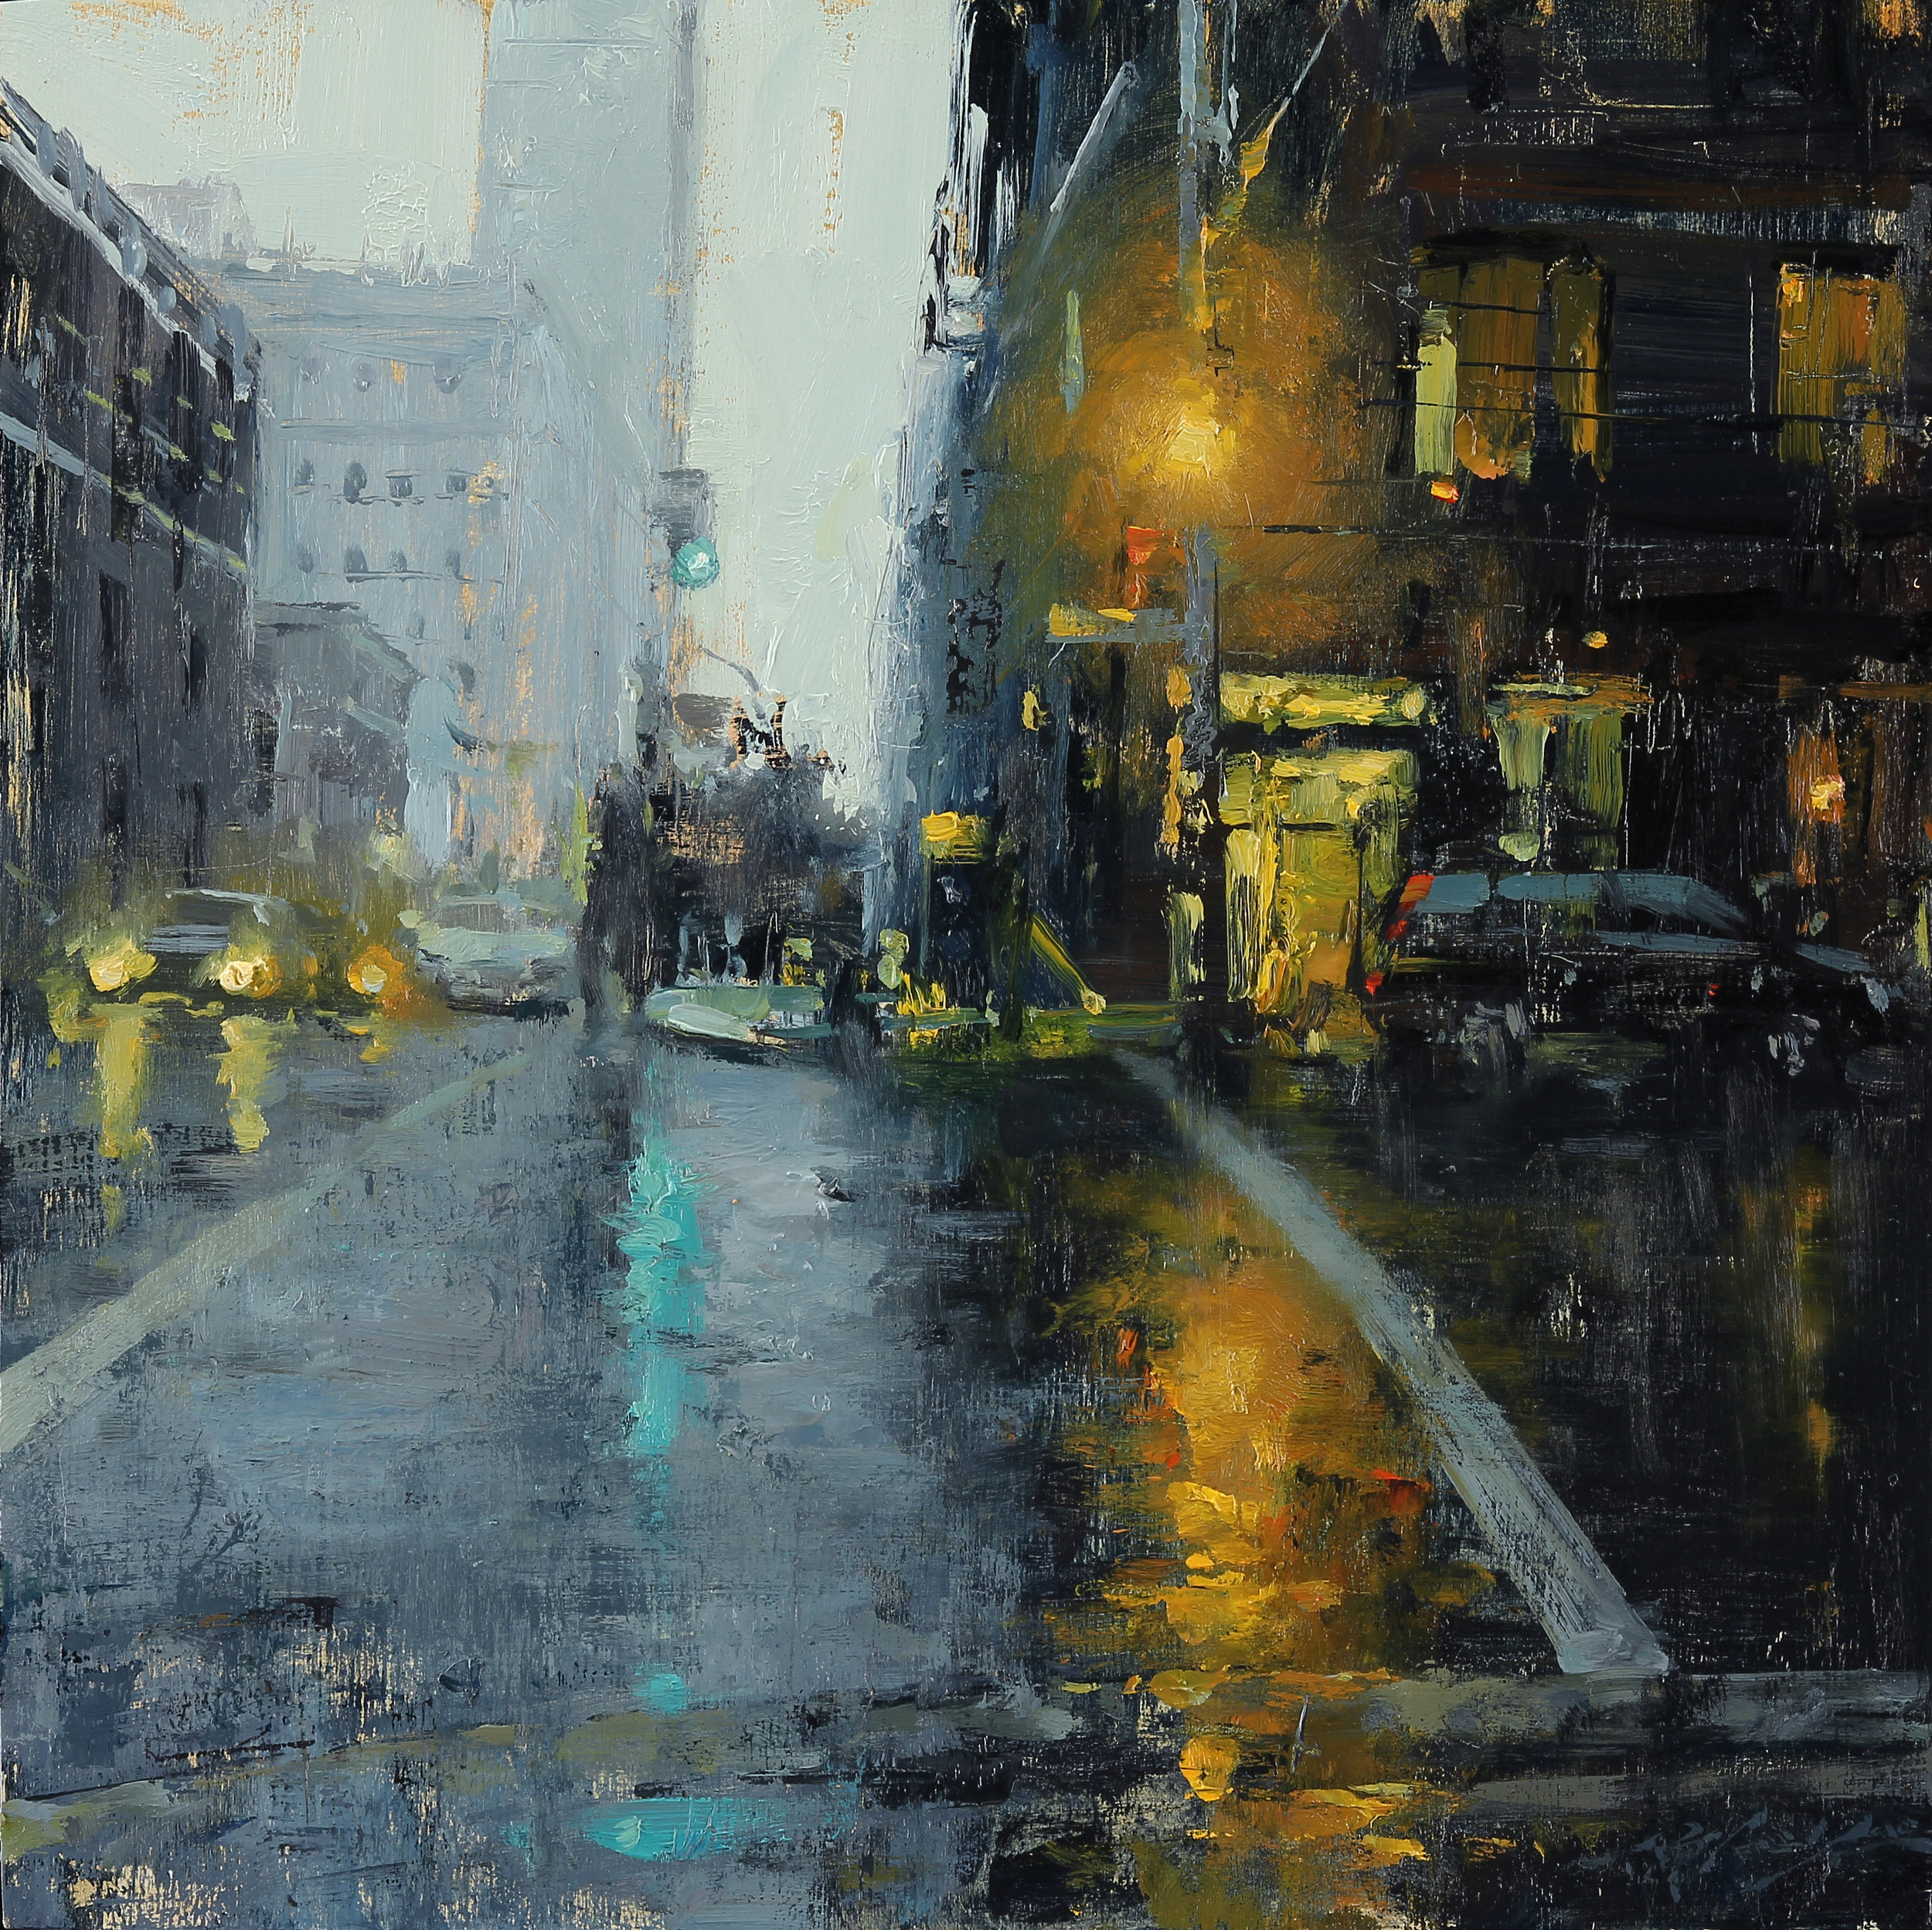 City Rain in Indigo